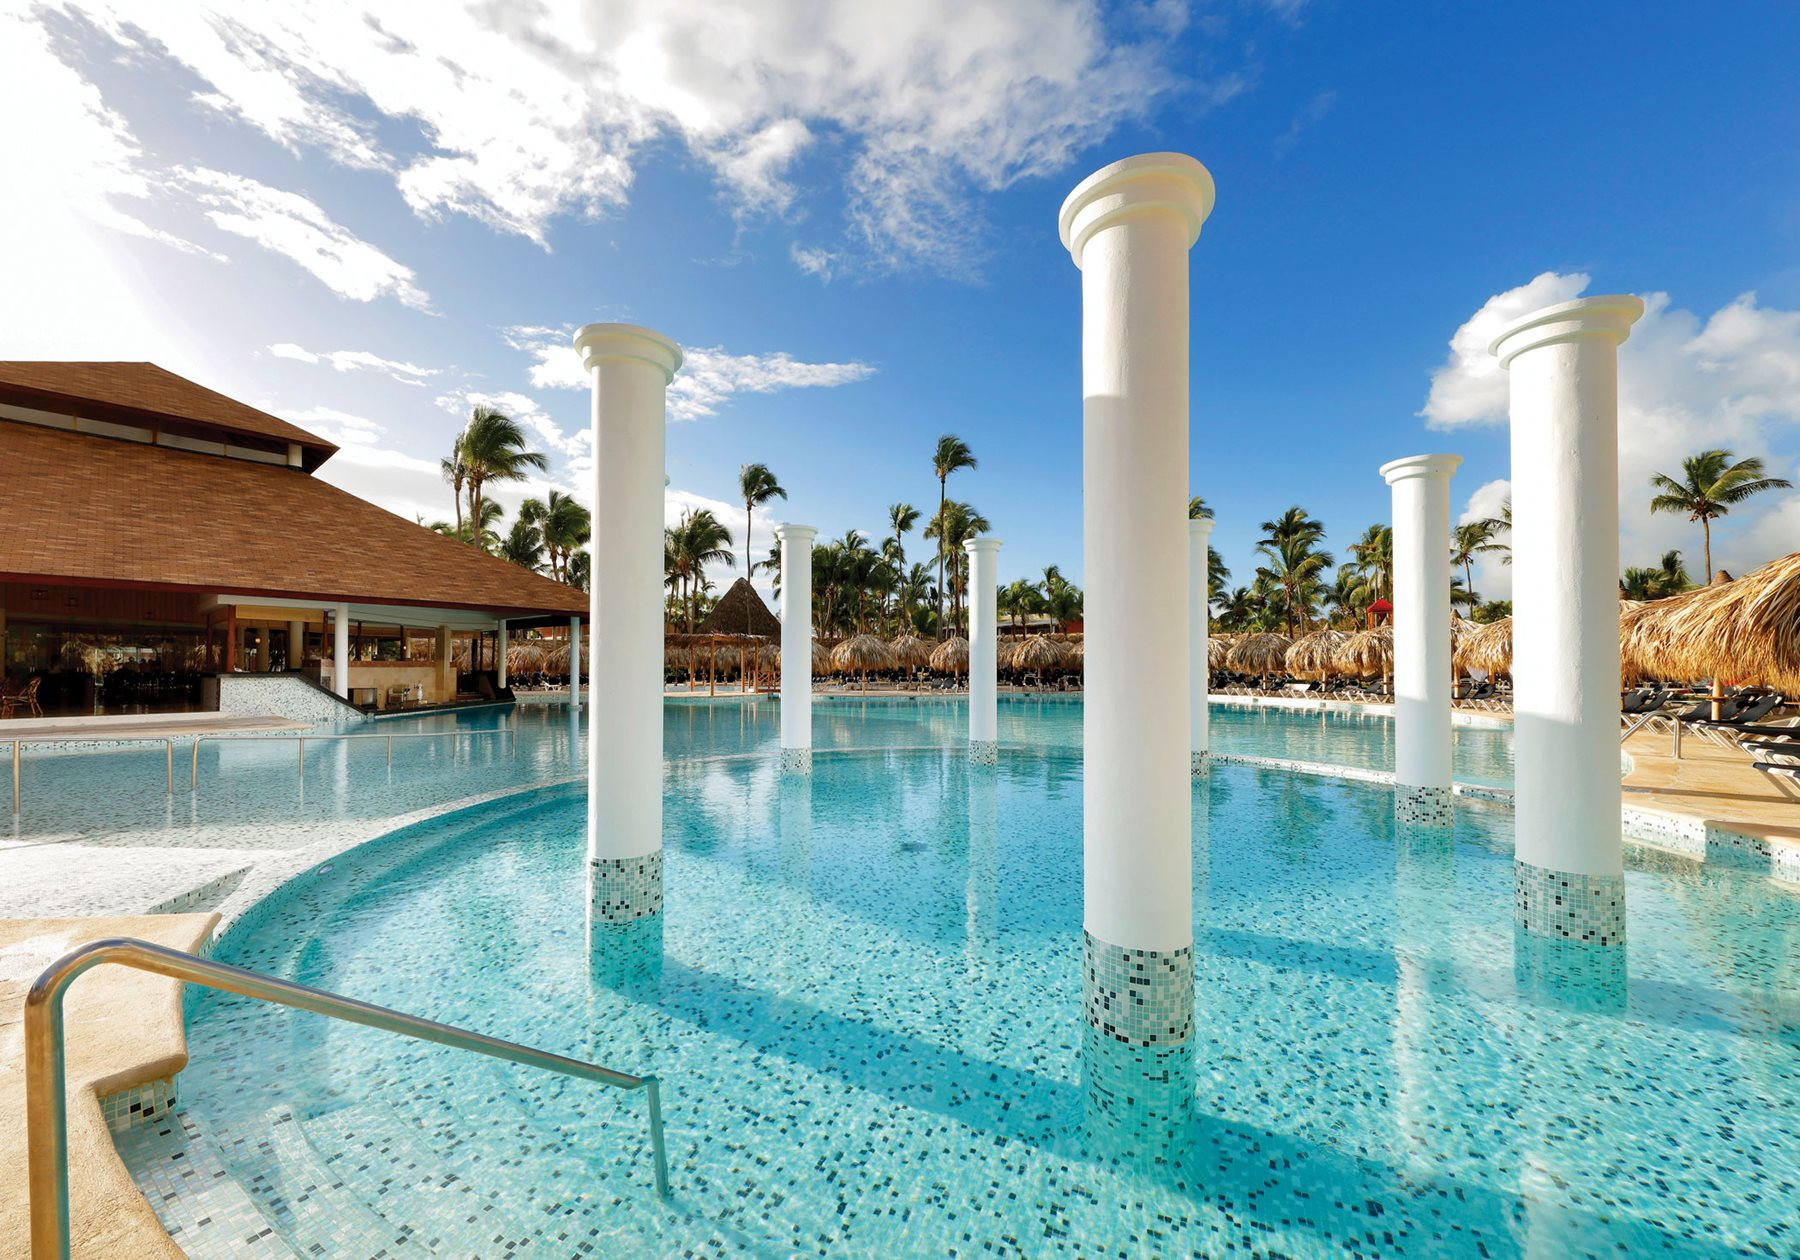 Grand Palladium Punta Cana Resort Amp Spa Punta Cana Transat